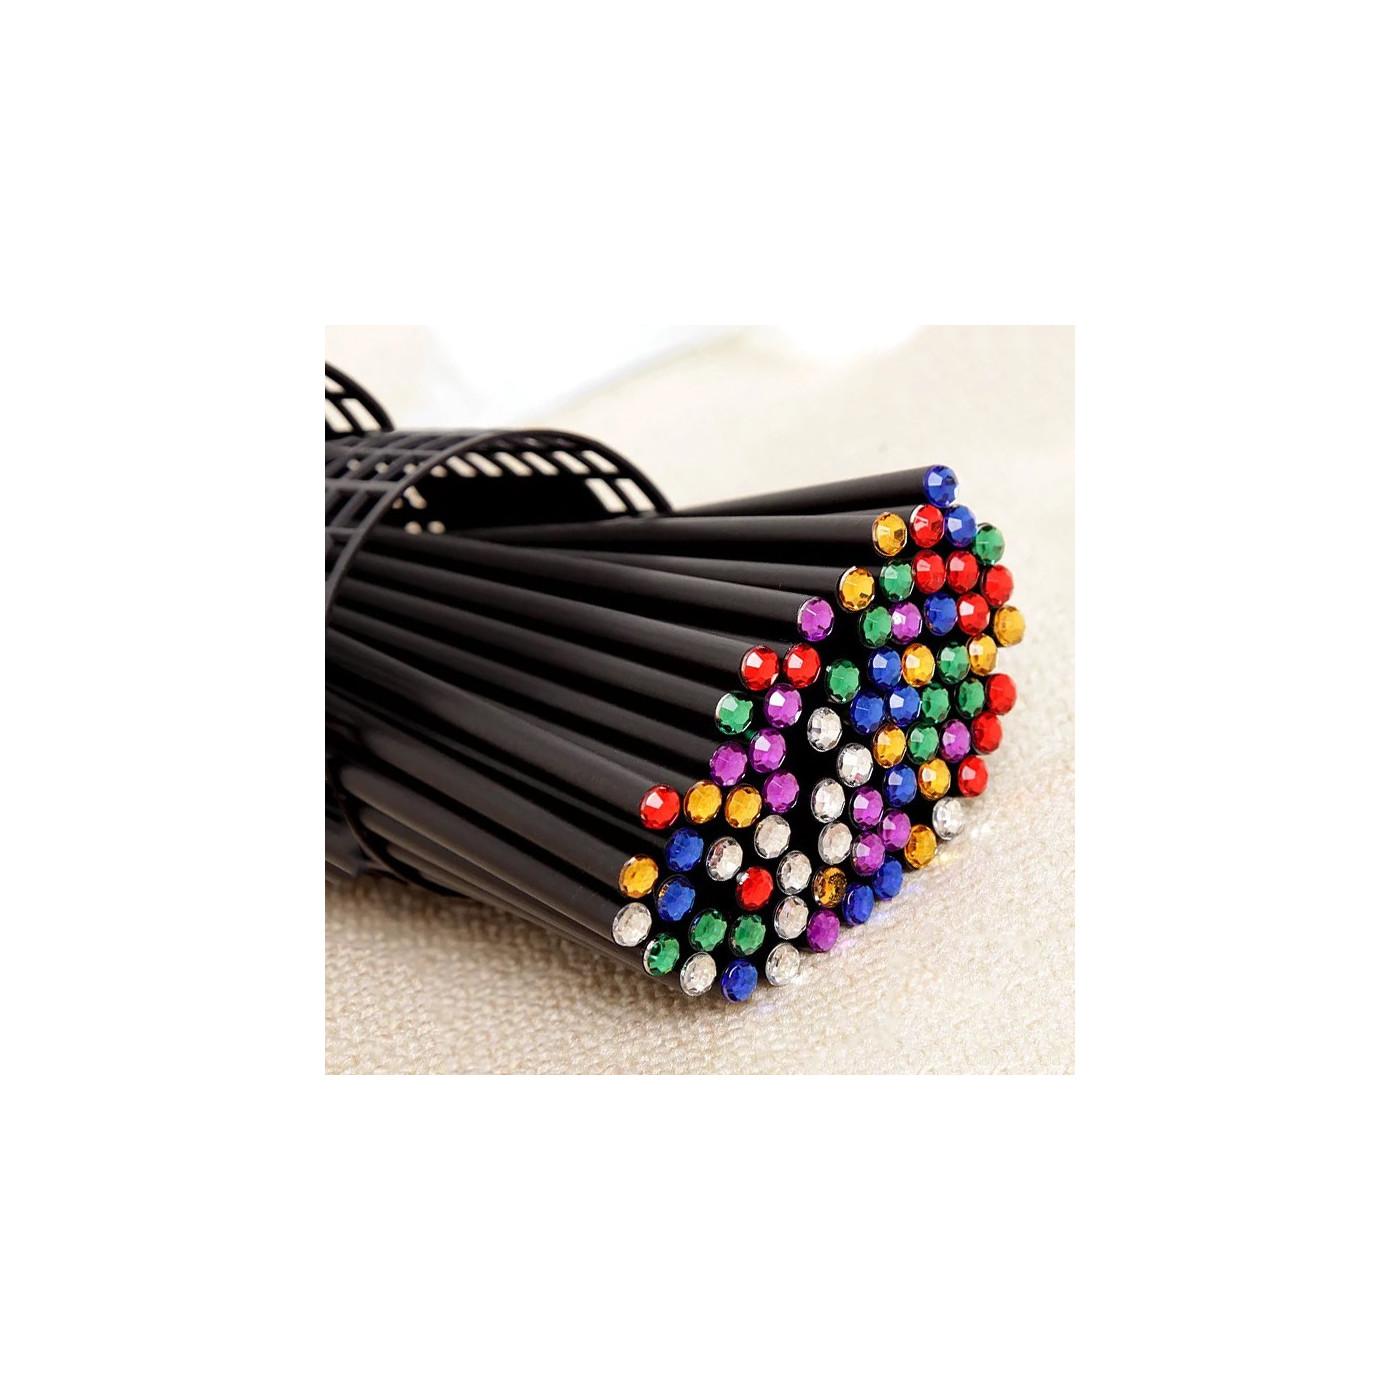 Conjunto de 40 lápices de madera negra con diamante.  - 1